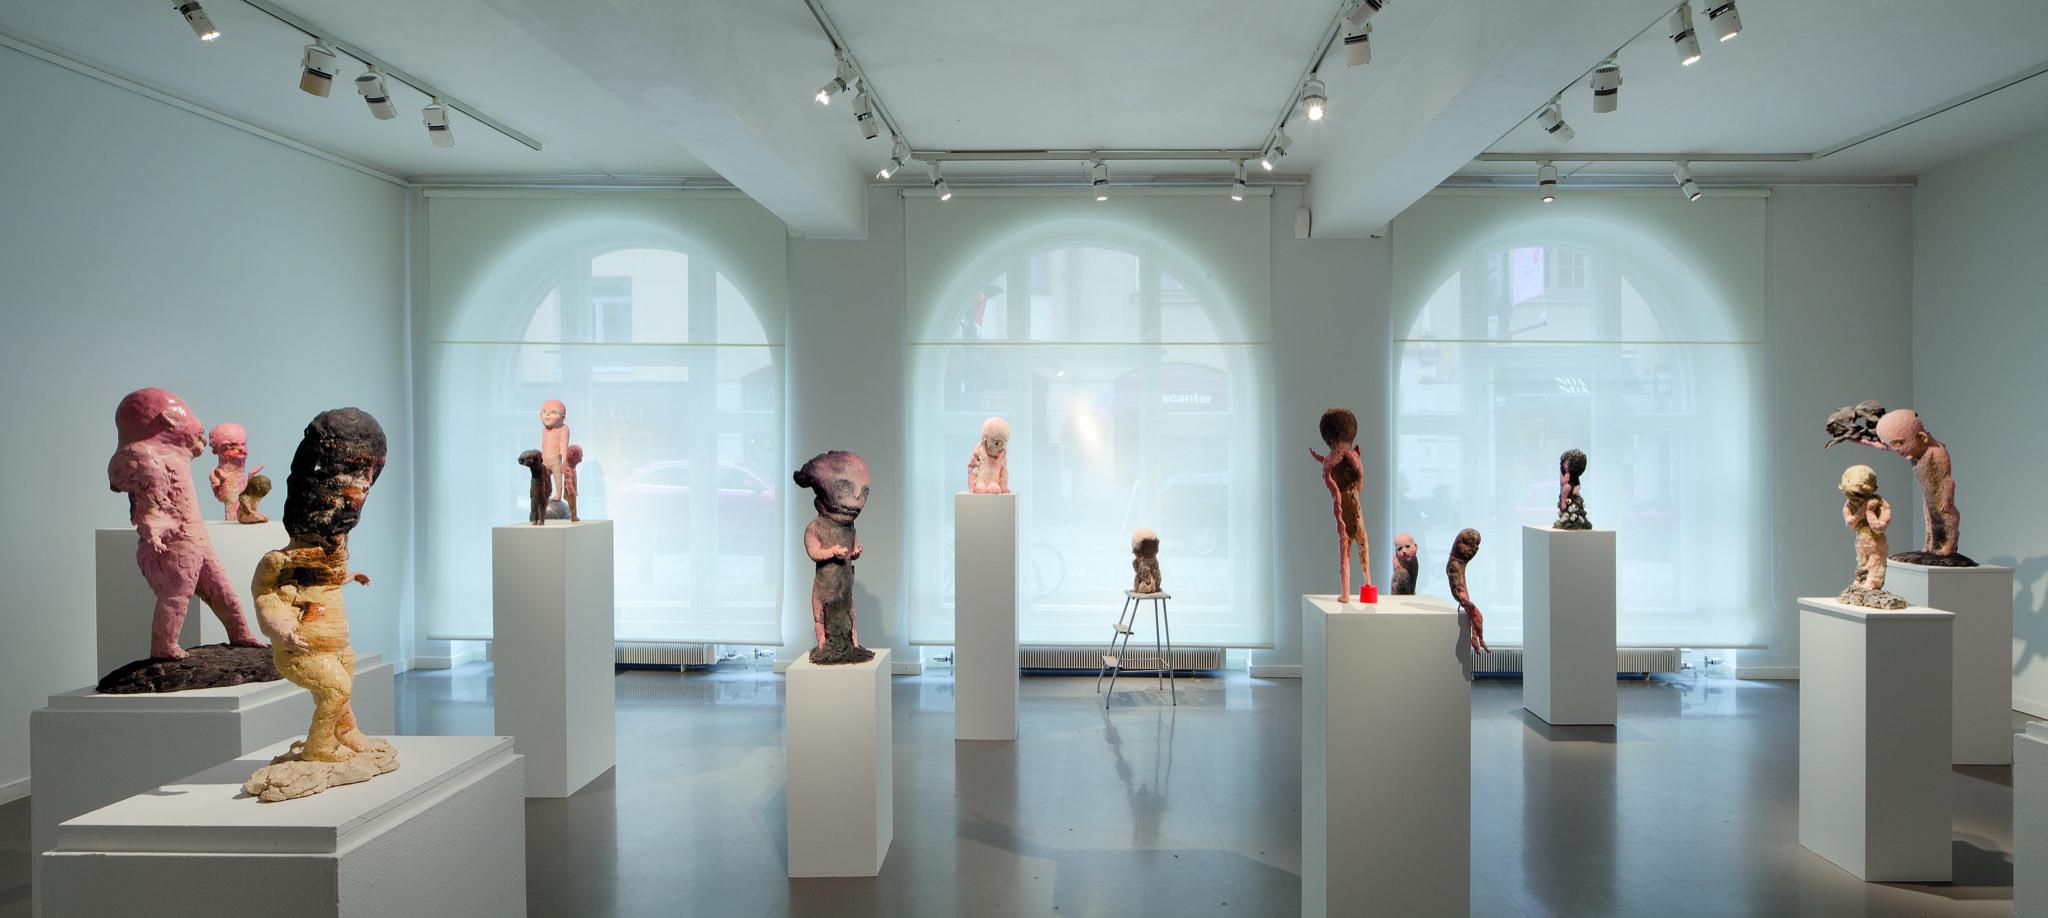 Mutatis Mutandis,Amos Anderson Art Museum,helsinki       2014 -